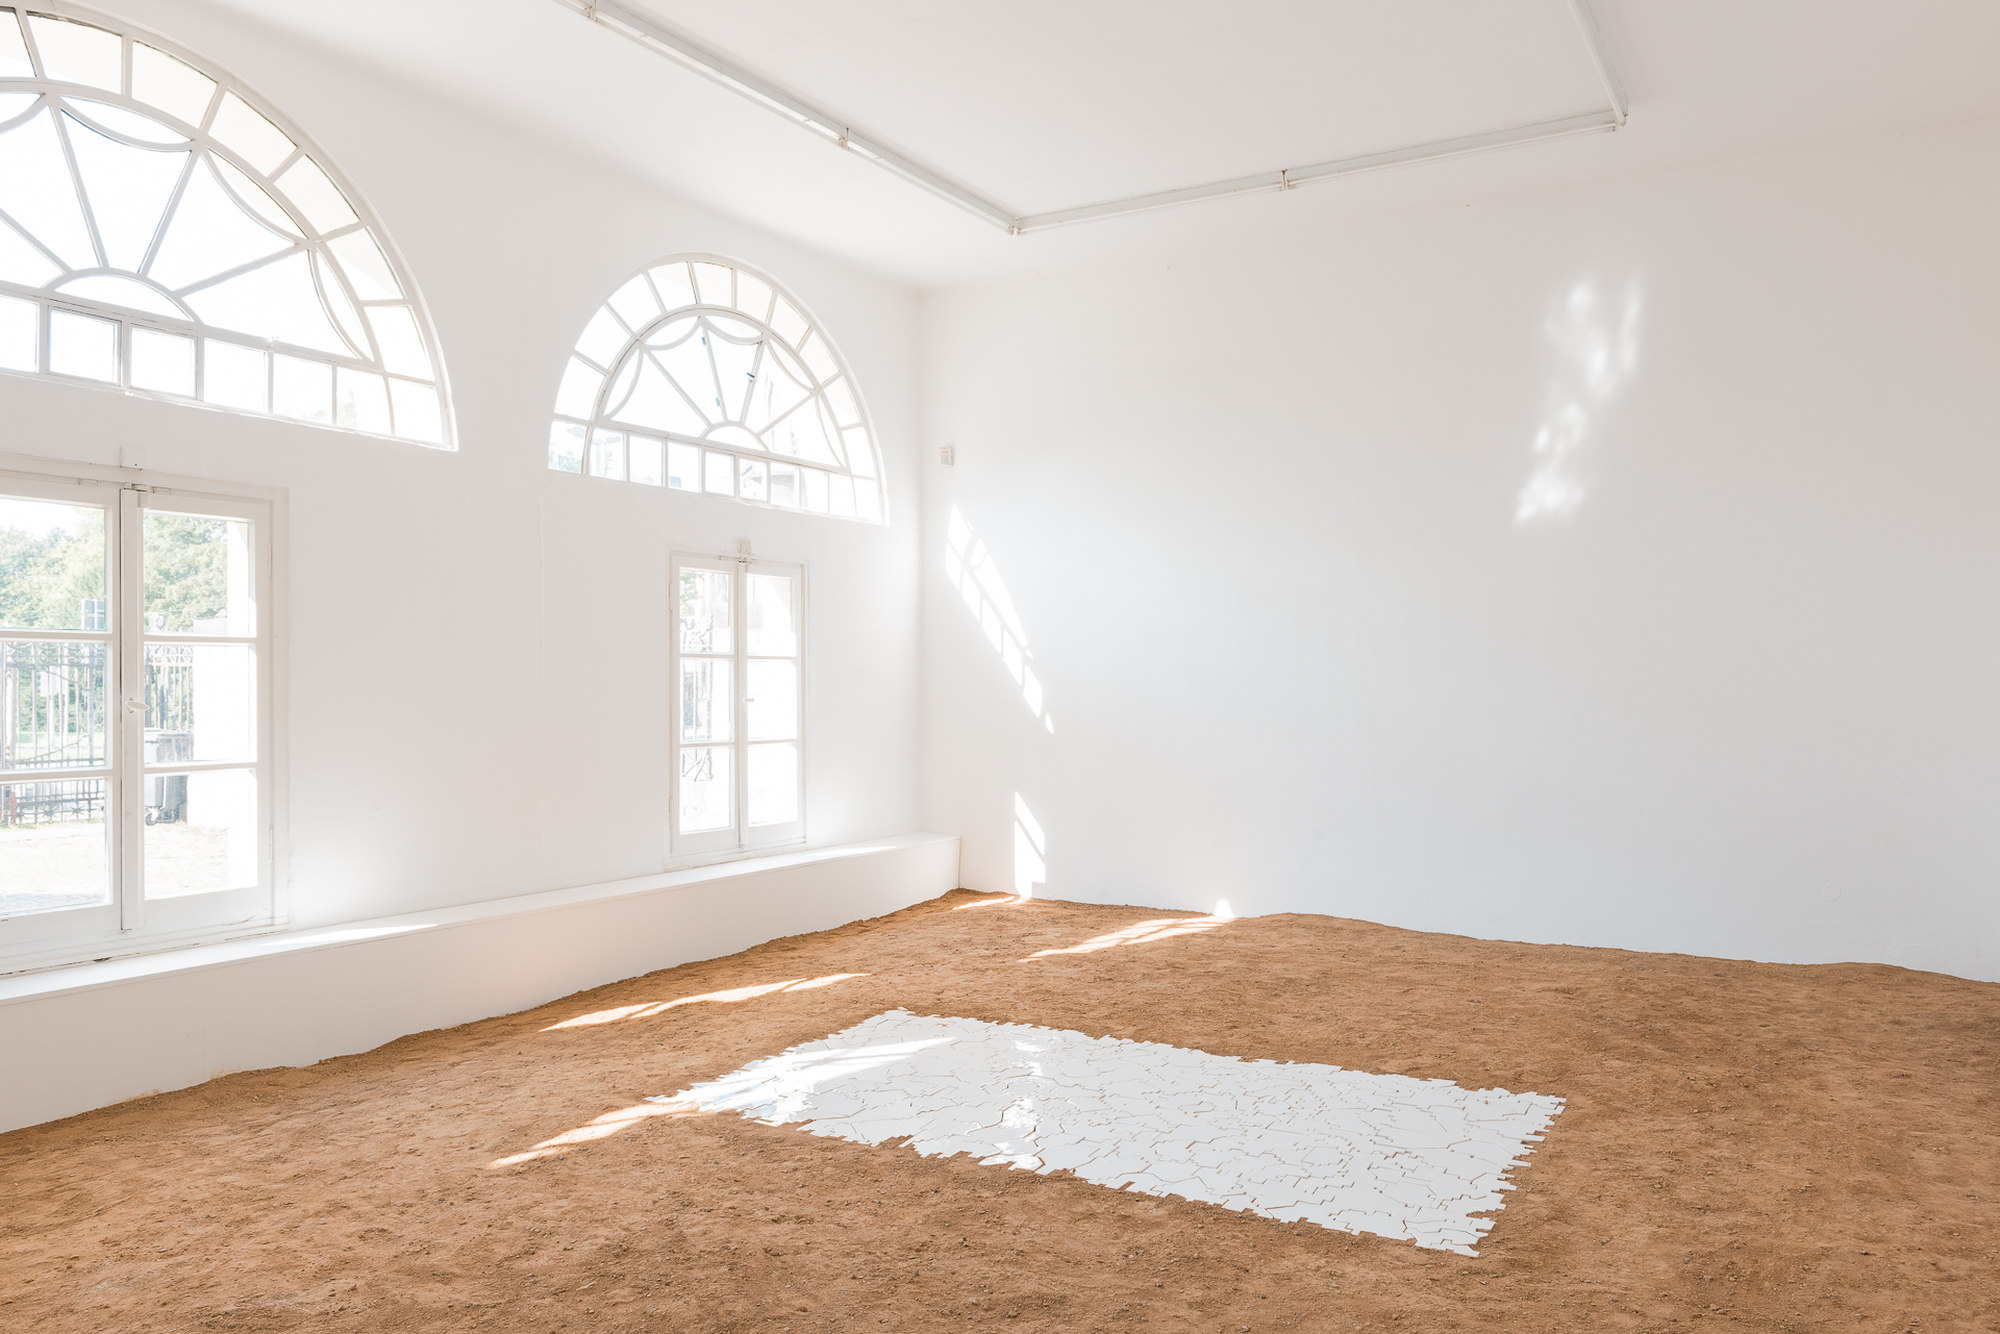 Anca Munteanu Rimnic at Kunstverein Braunschweig 1